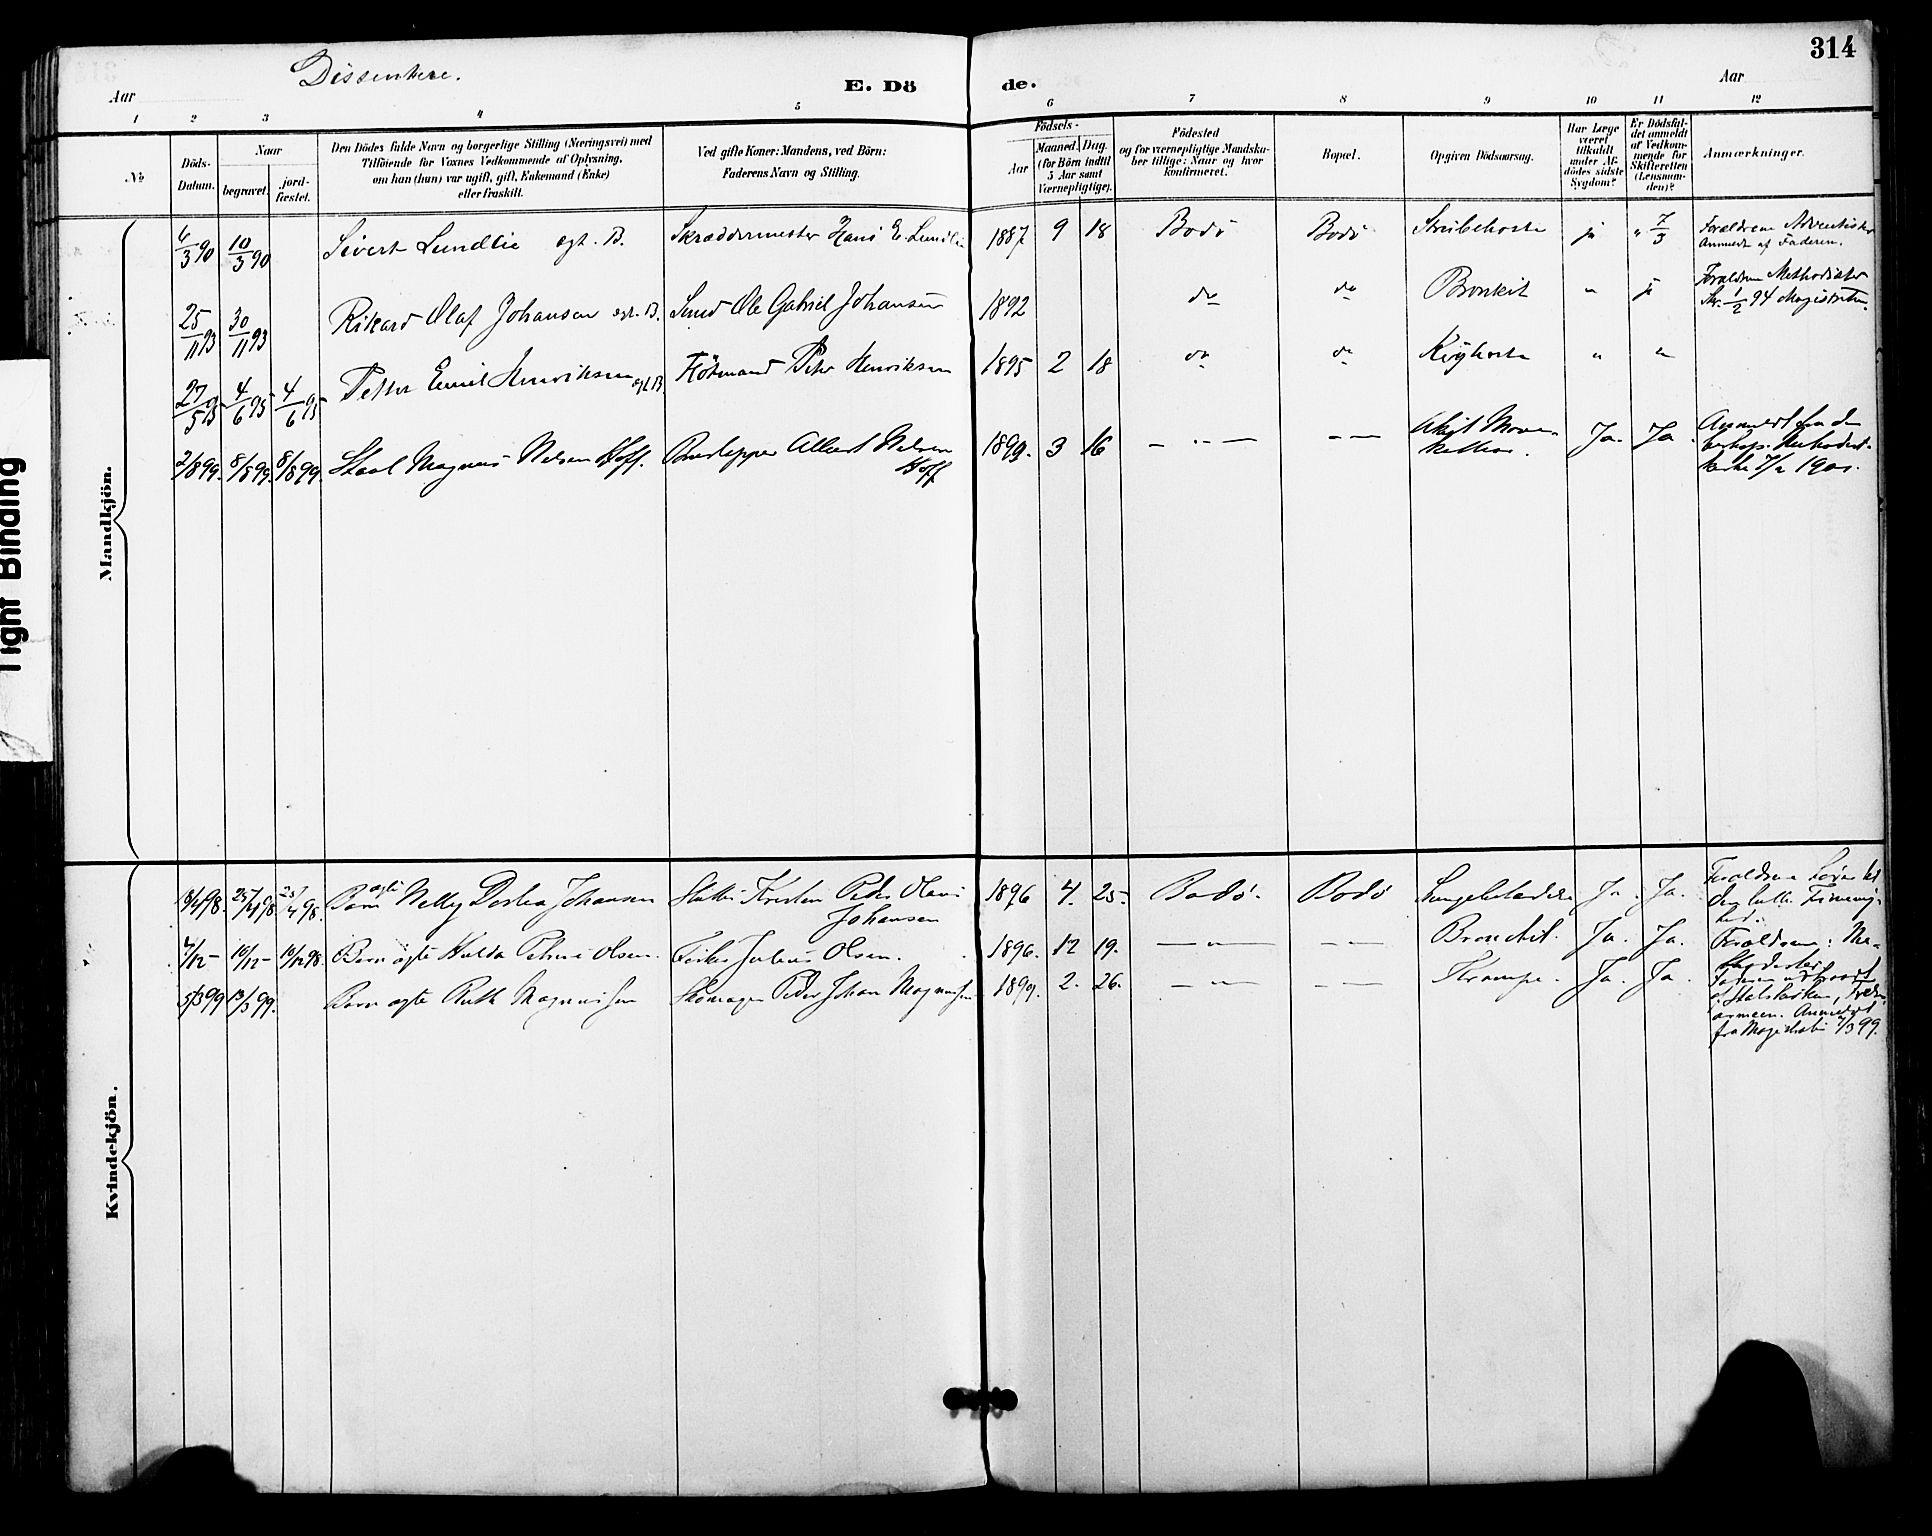 SAT, Ministerialprotokoller, klokkerbøker og fødselsregistre - Nordland, 801/L0010: Ministerialbok nr. 801A10, 1888-1899, s. 314